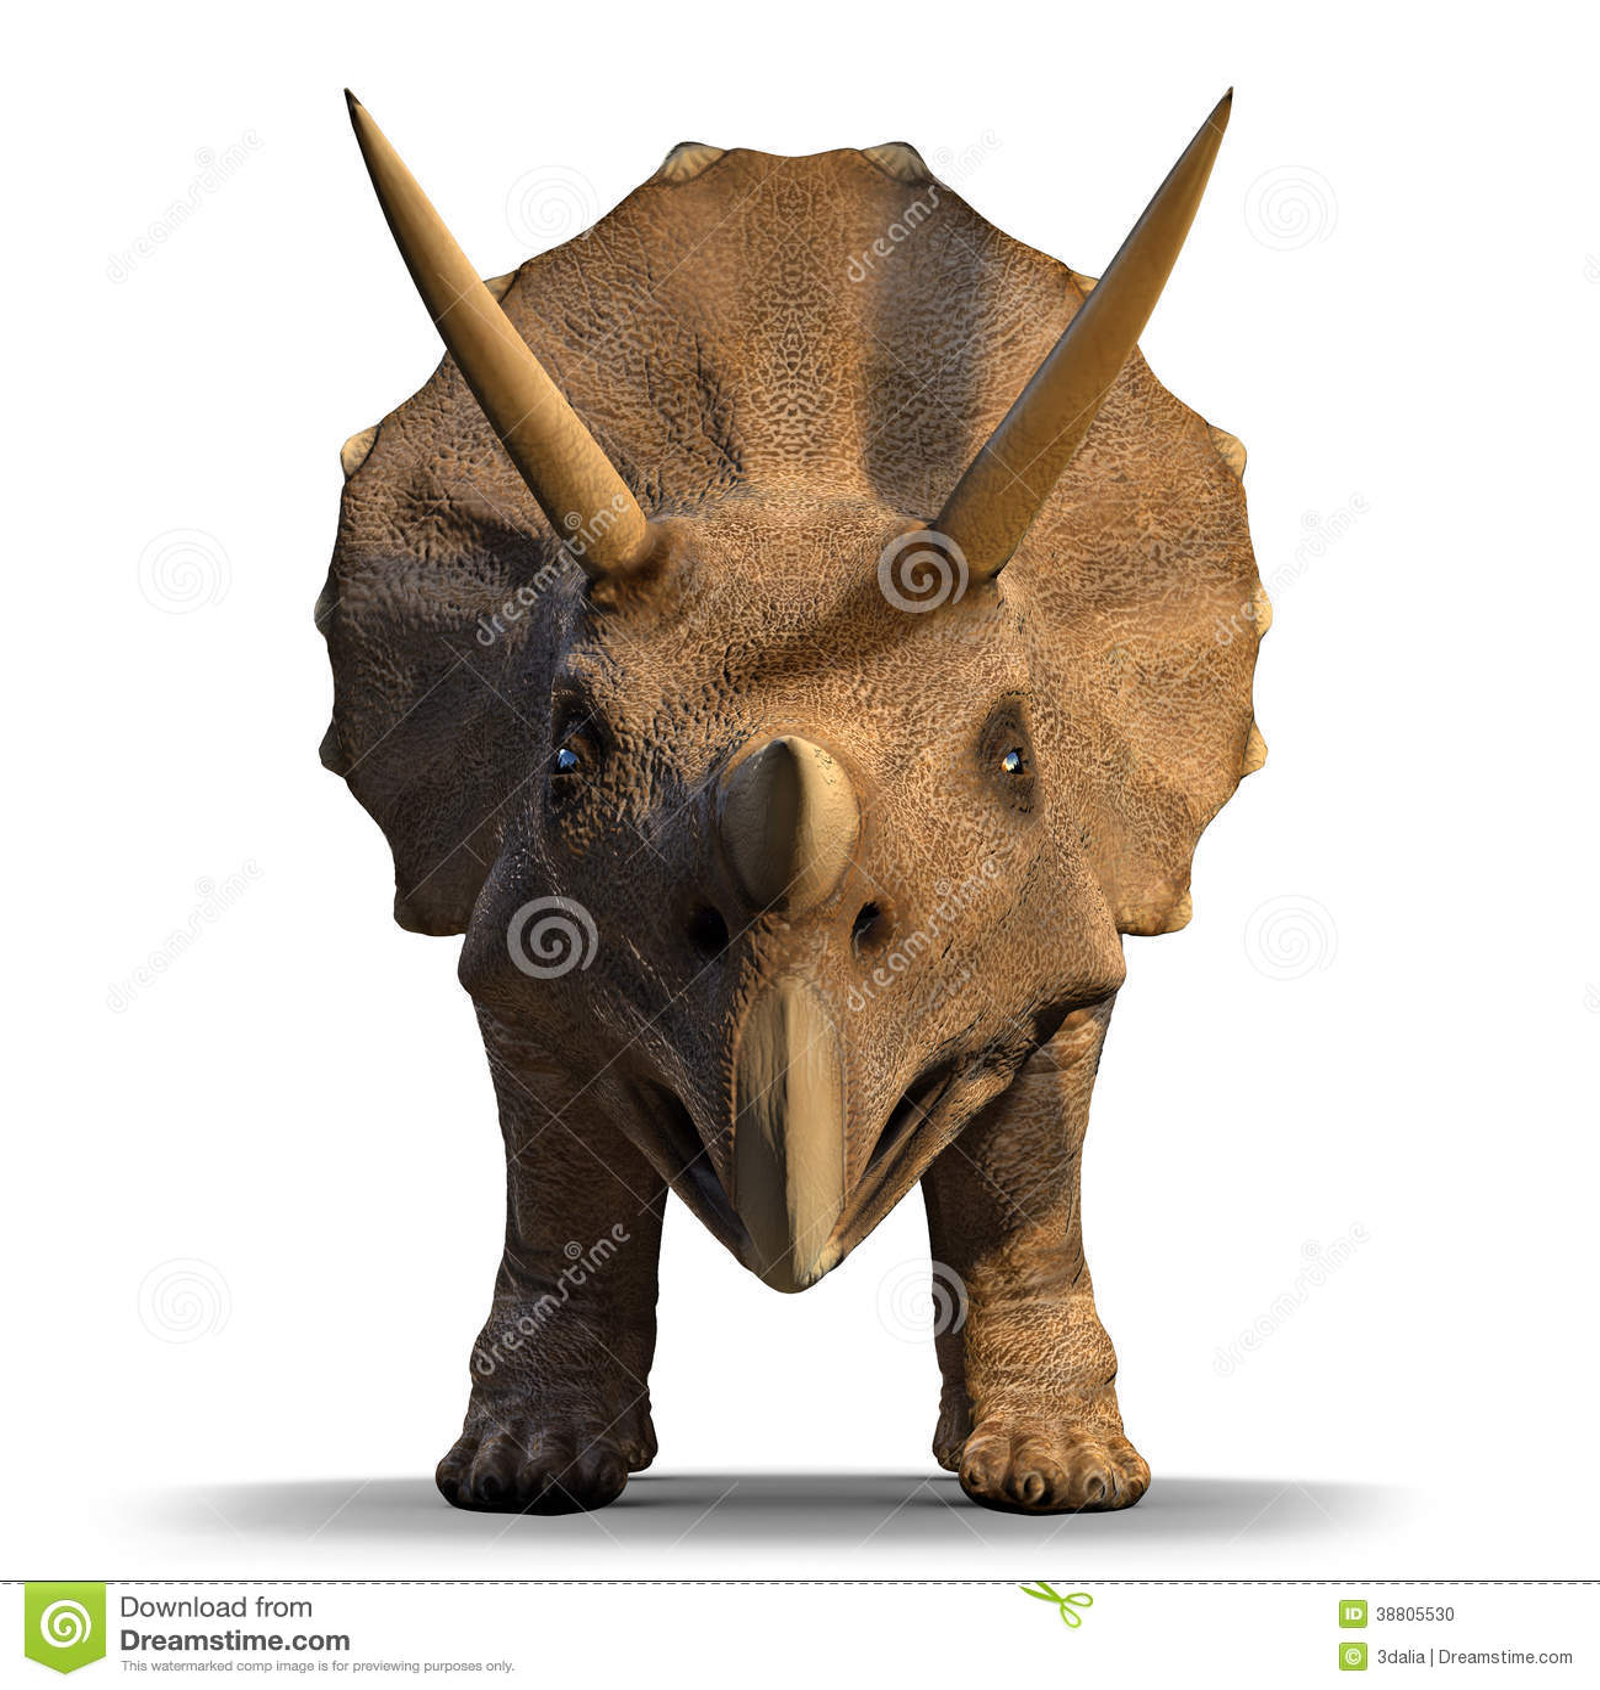 Raptor skull and brain drawing : pics |Velociraptor Skull Front